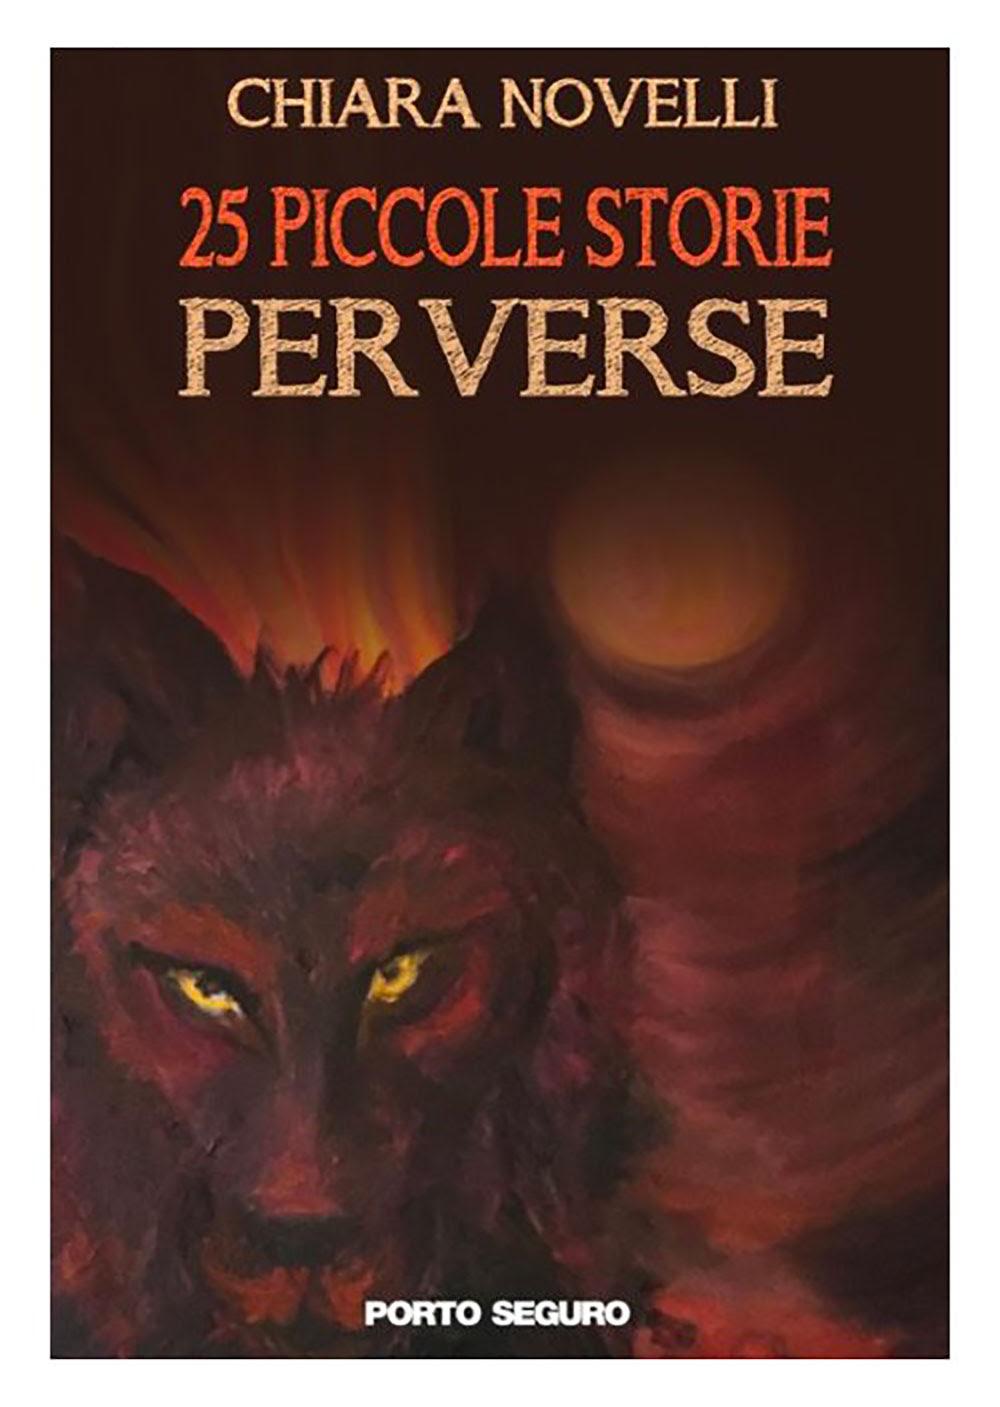 25 piccole storie perverse